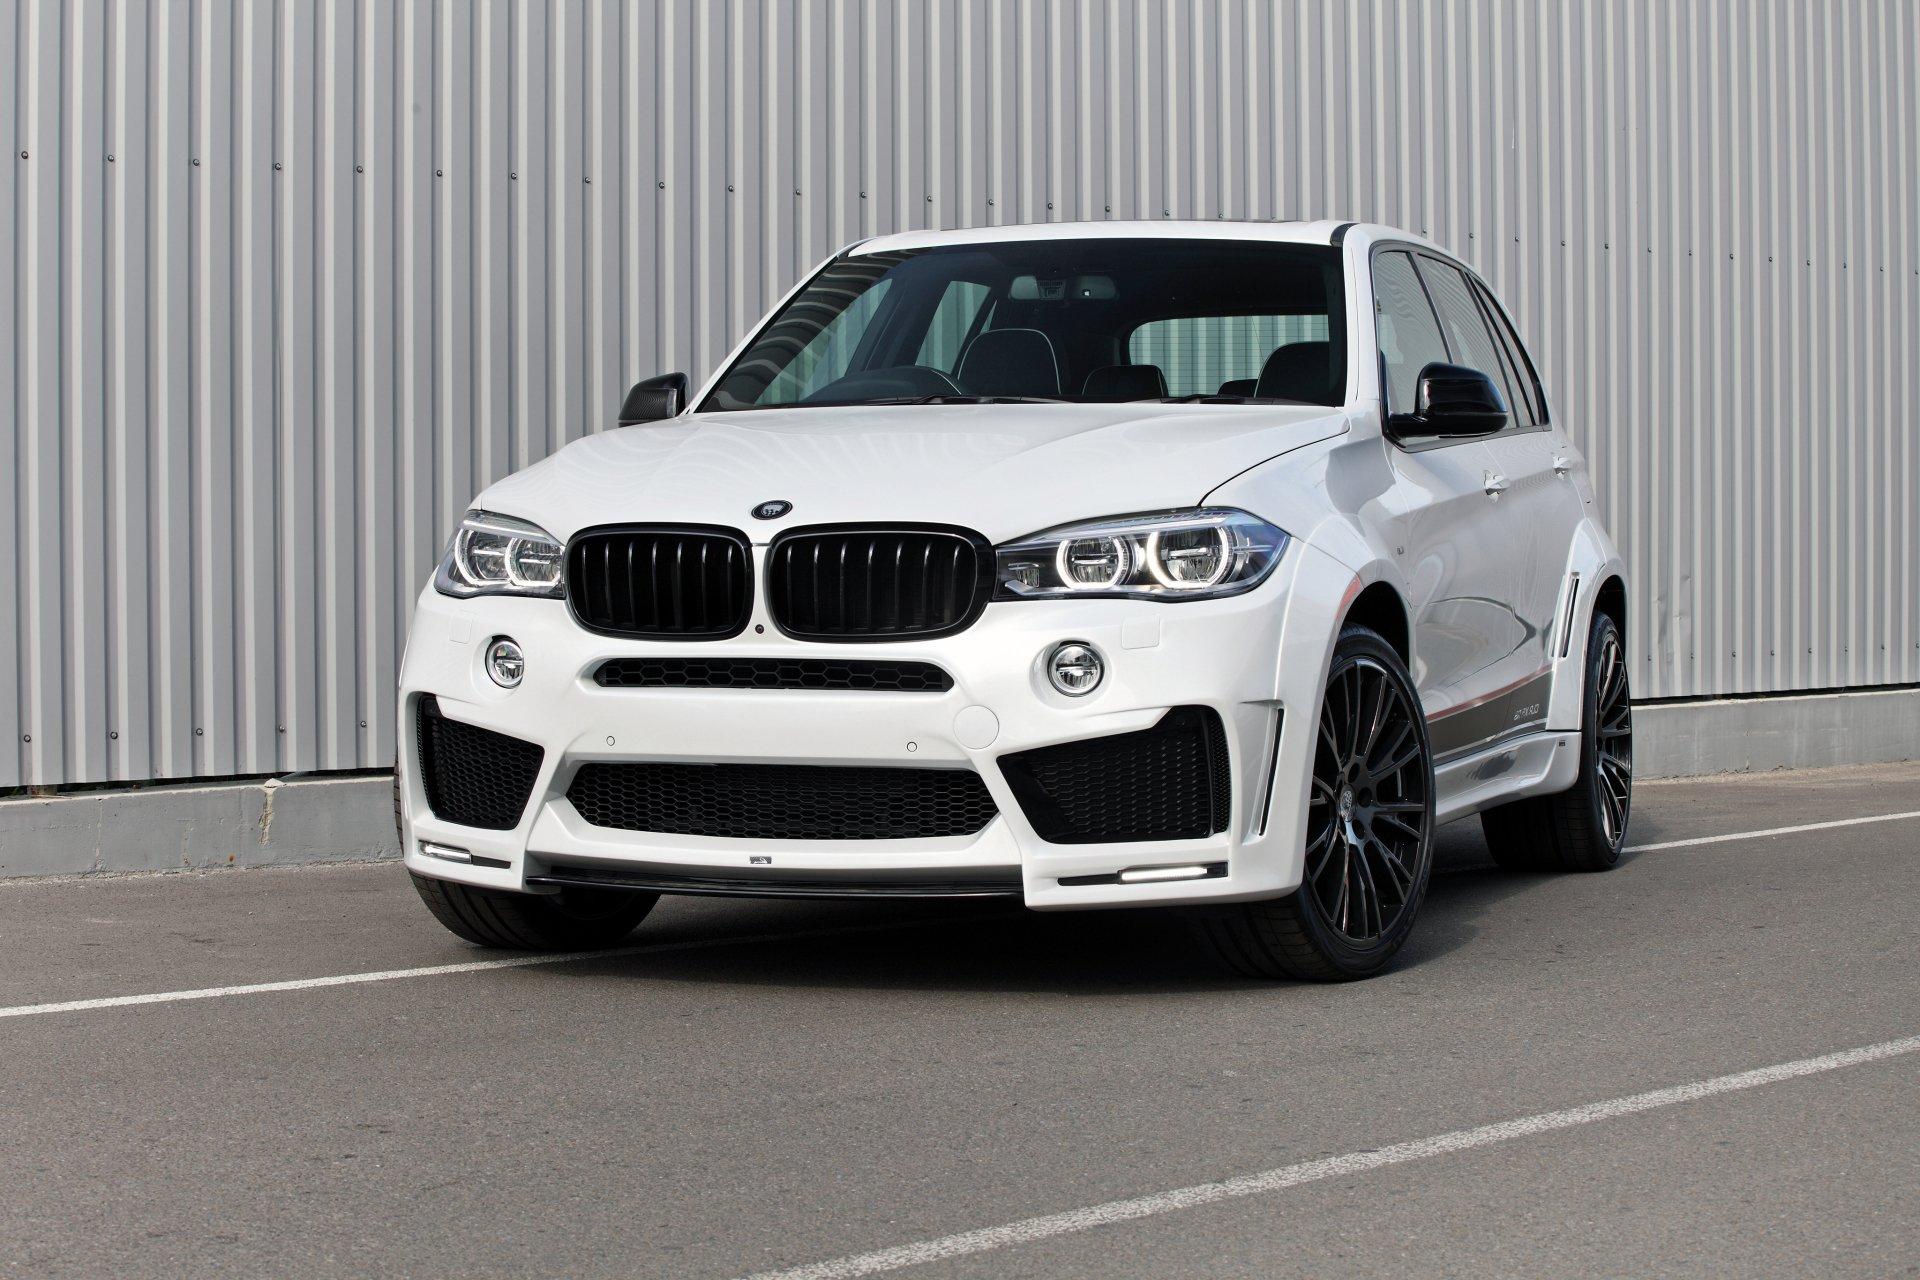 BMW X5 4k Ultra HD Wallpaper   Background Image ...